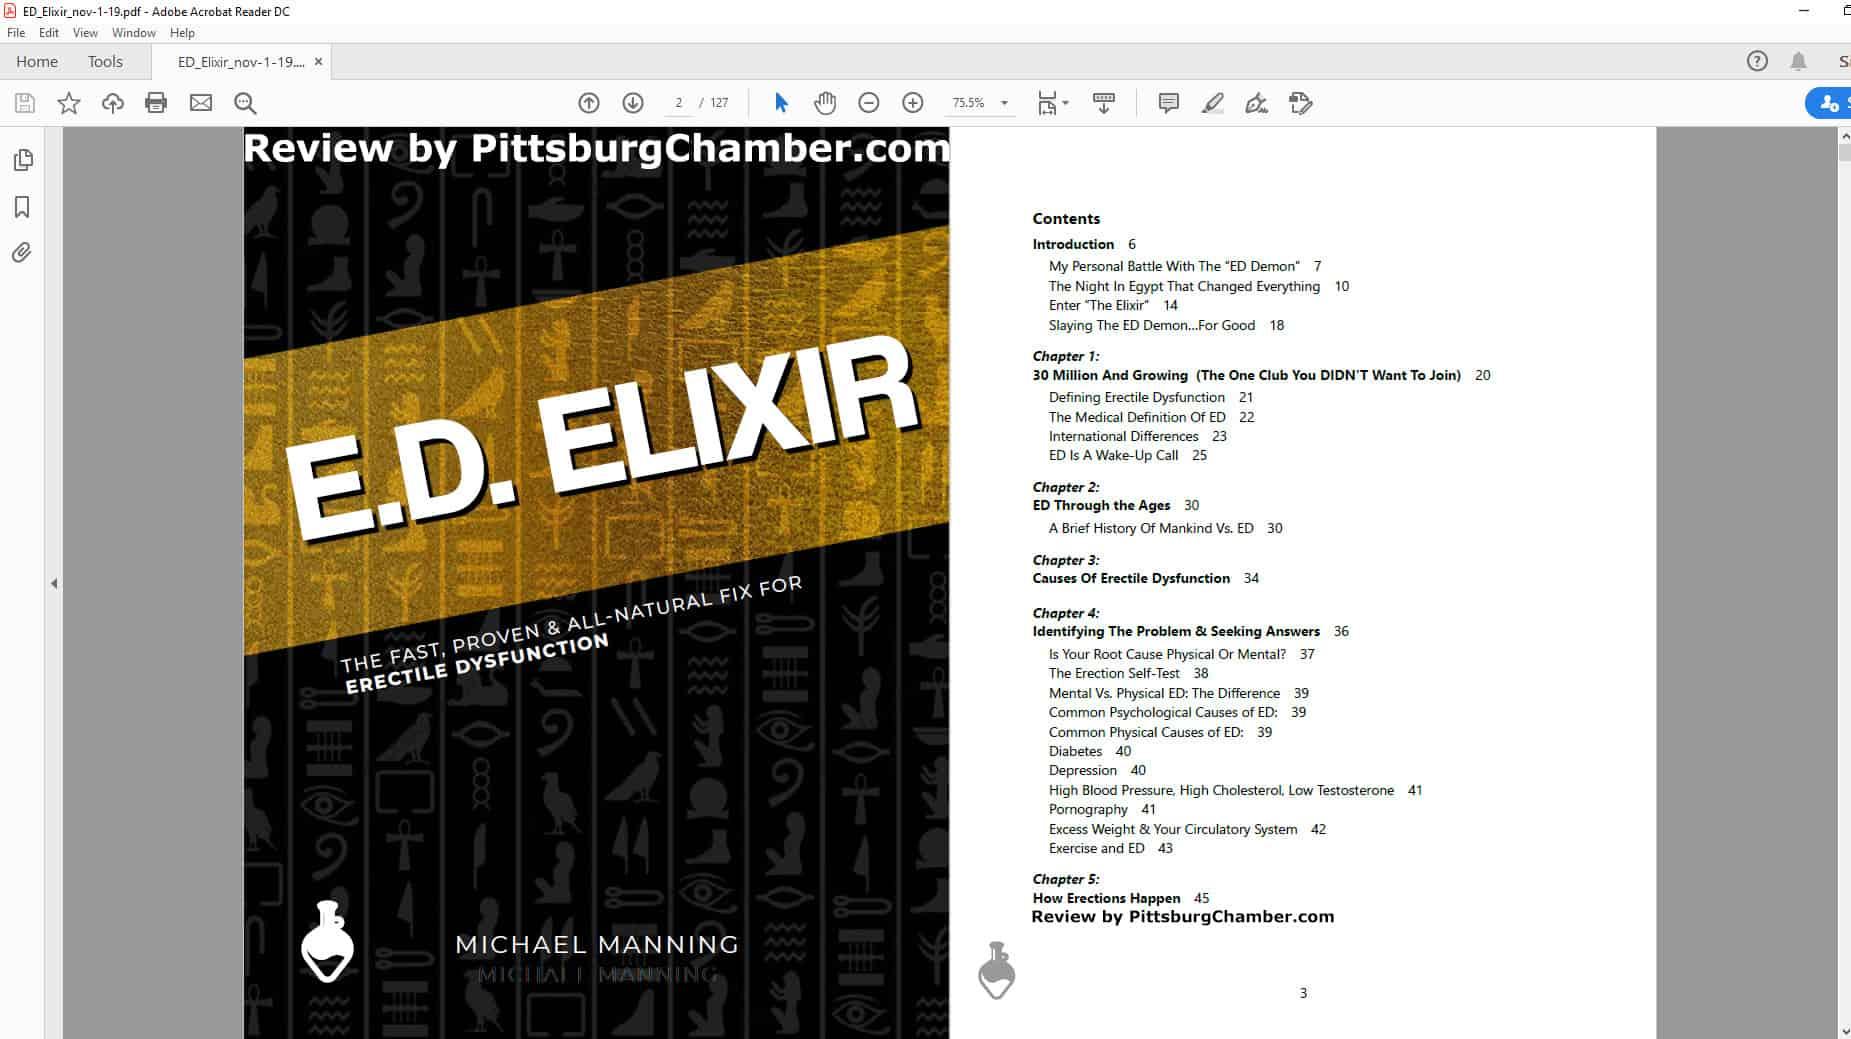 E.D. Elixir Table of Contents